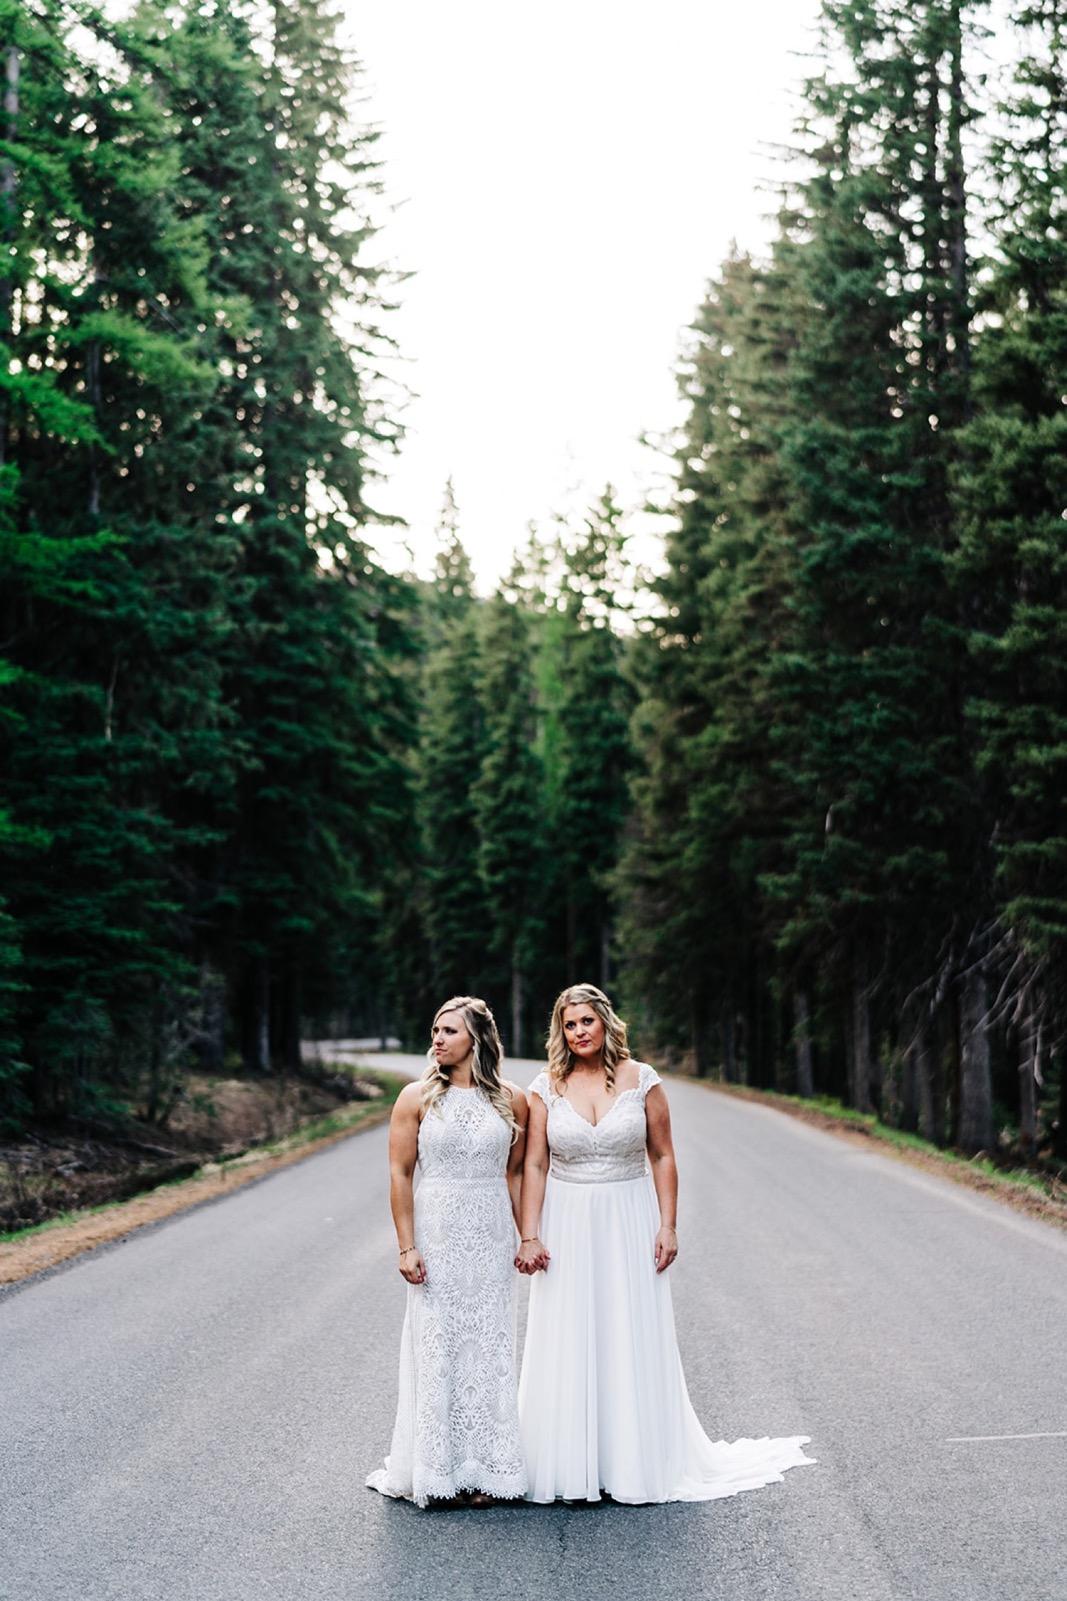 196_falissa_heather_wedding-550.jpg